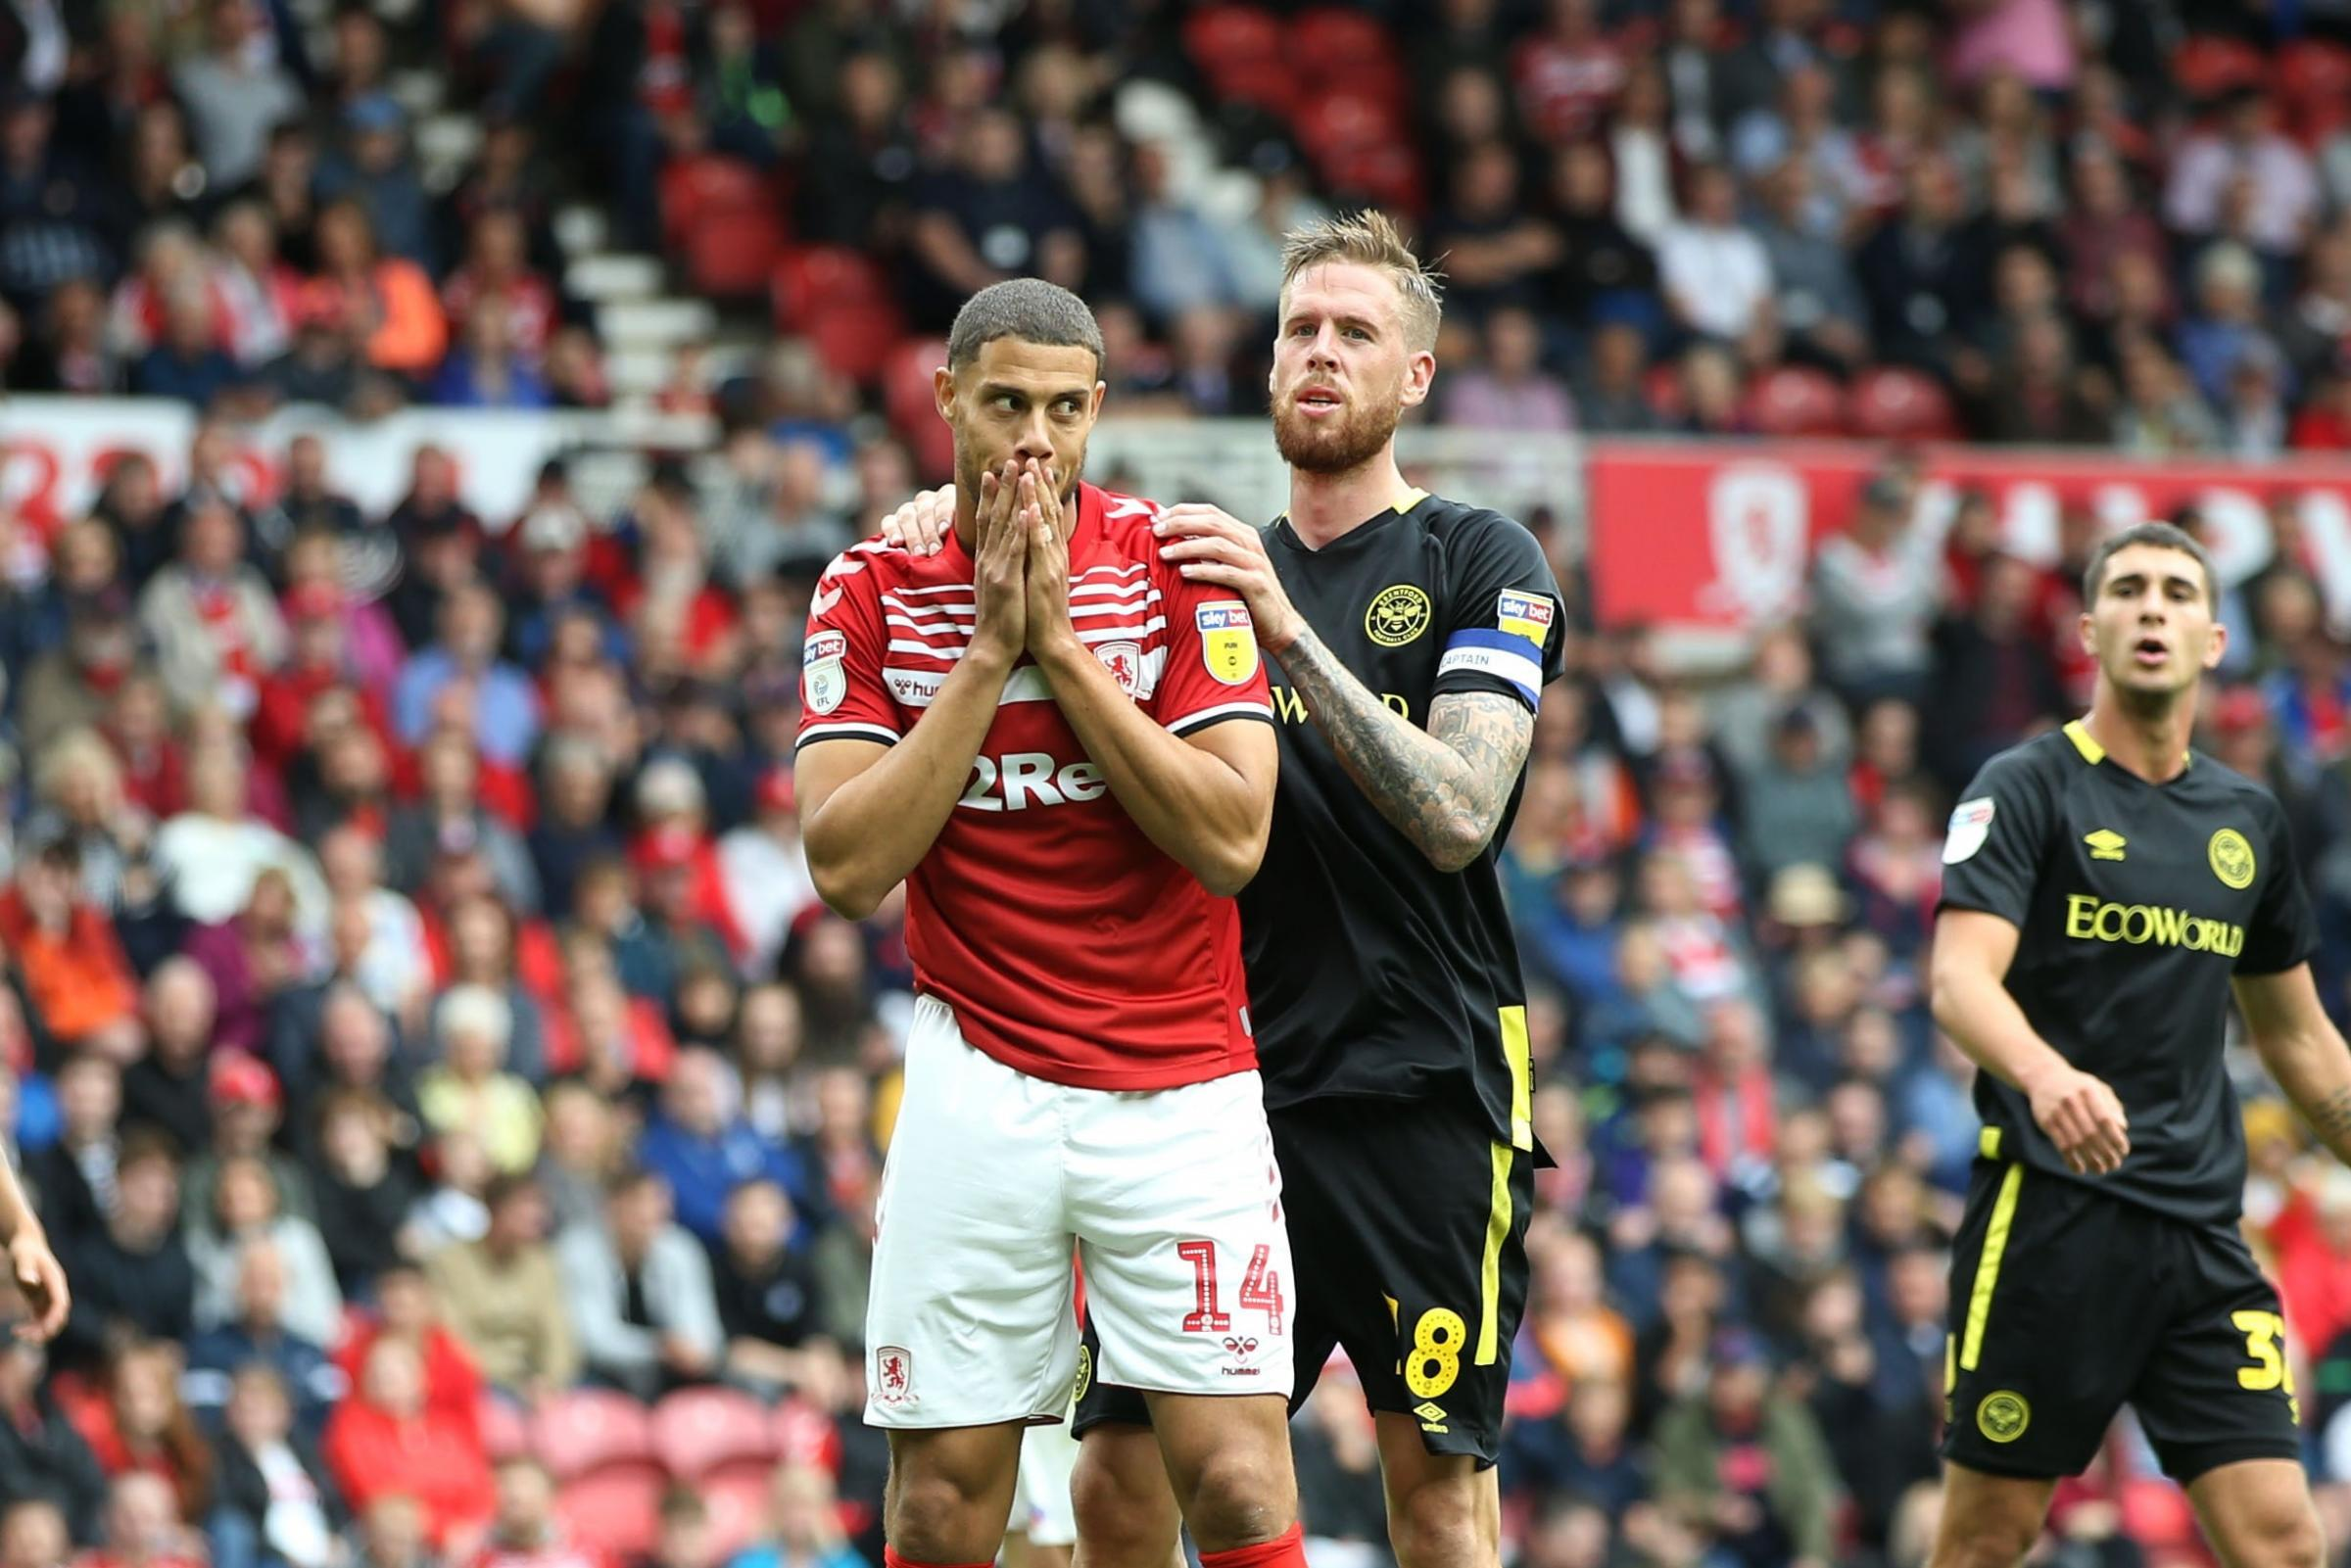 Boro striker suffers further injury woe during international break